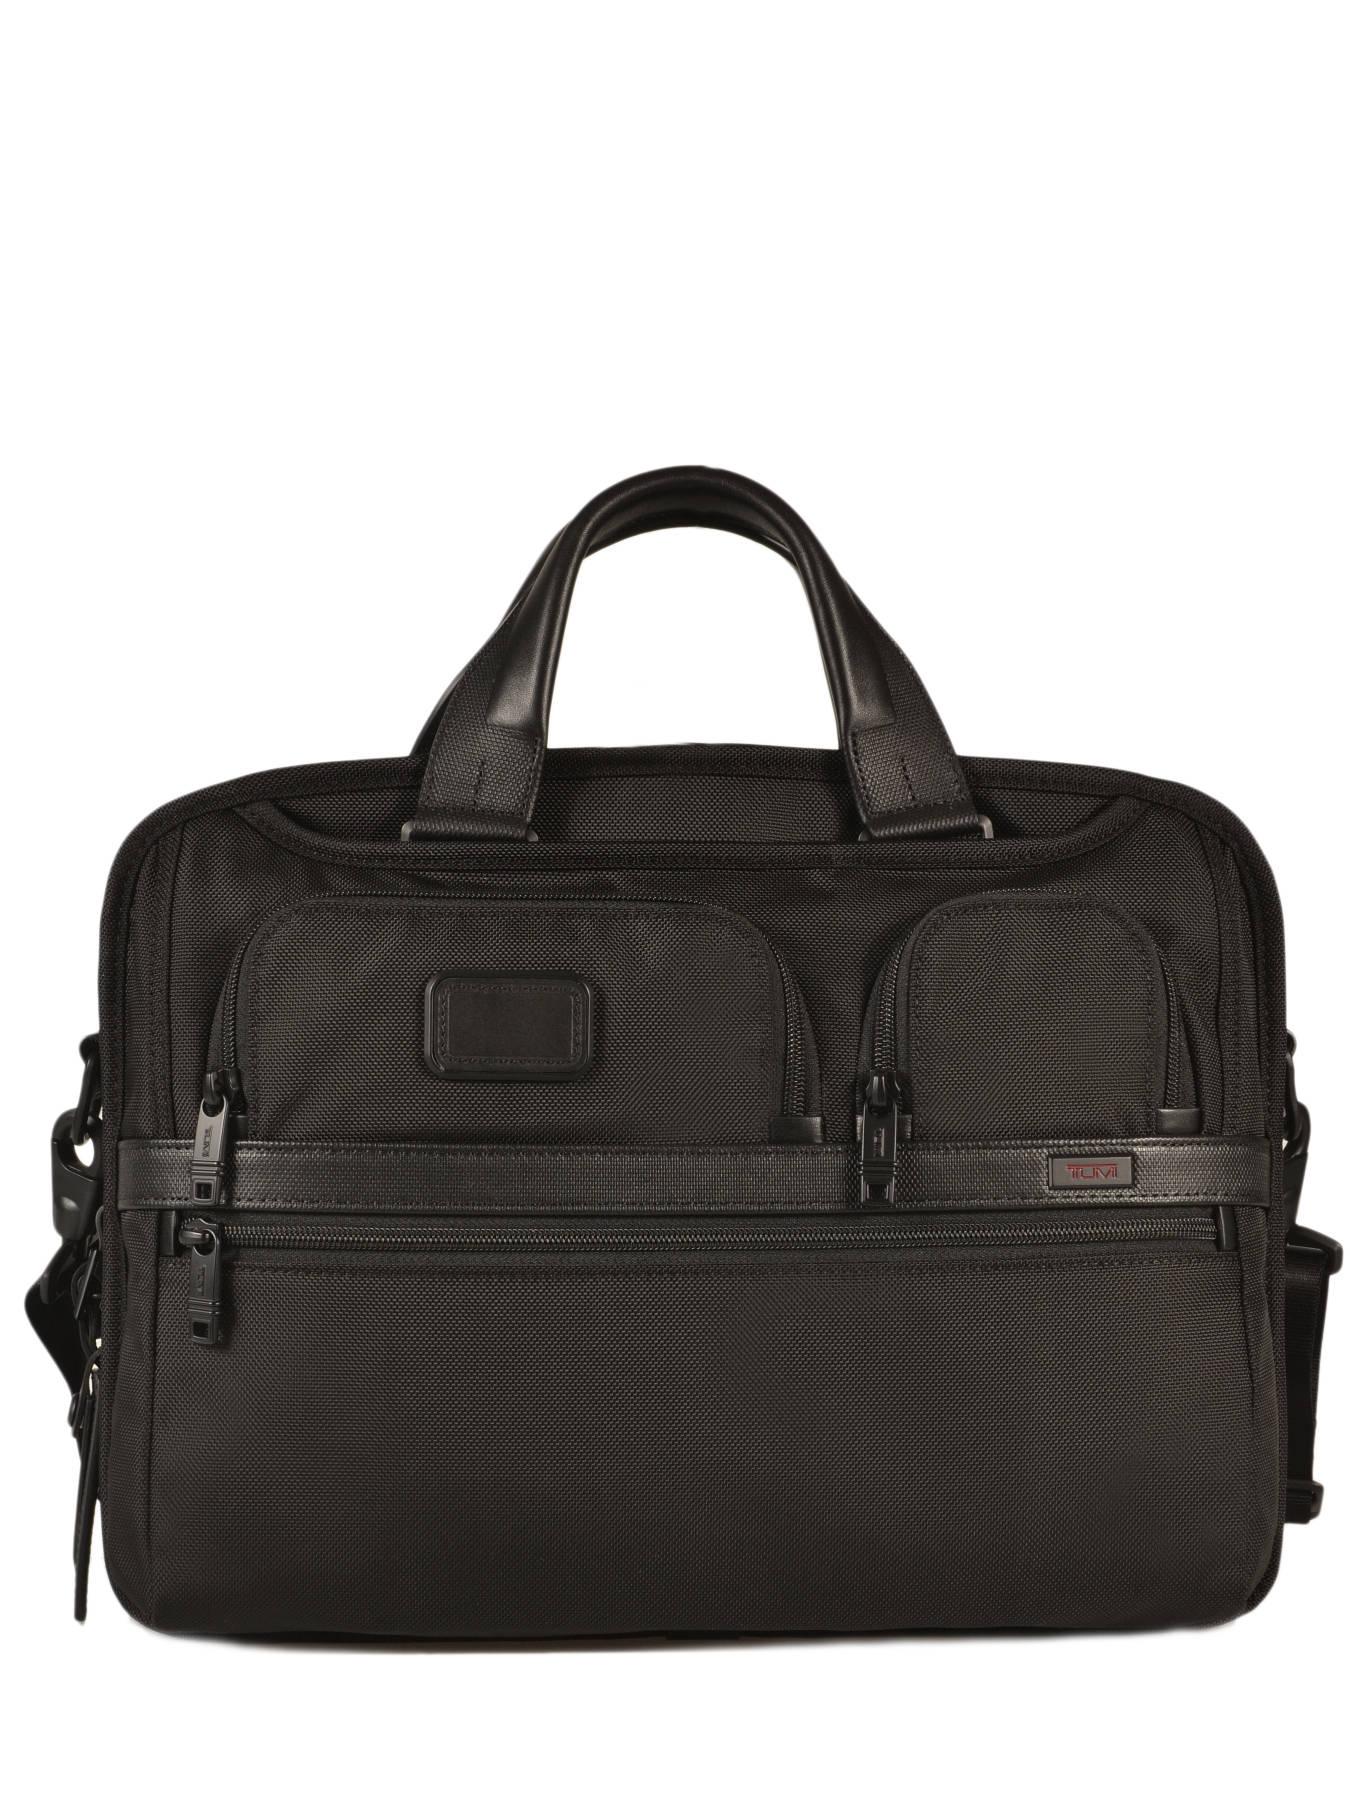 Briefcase Tumi Black alpha 2 business DH26516